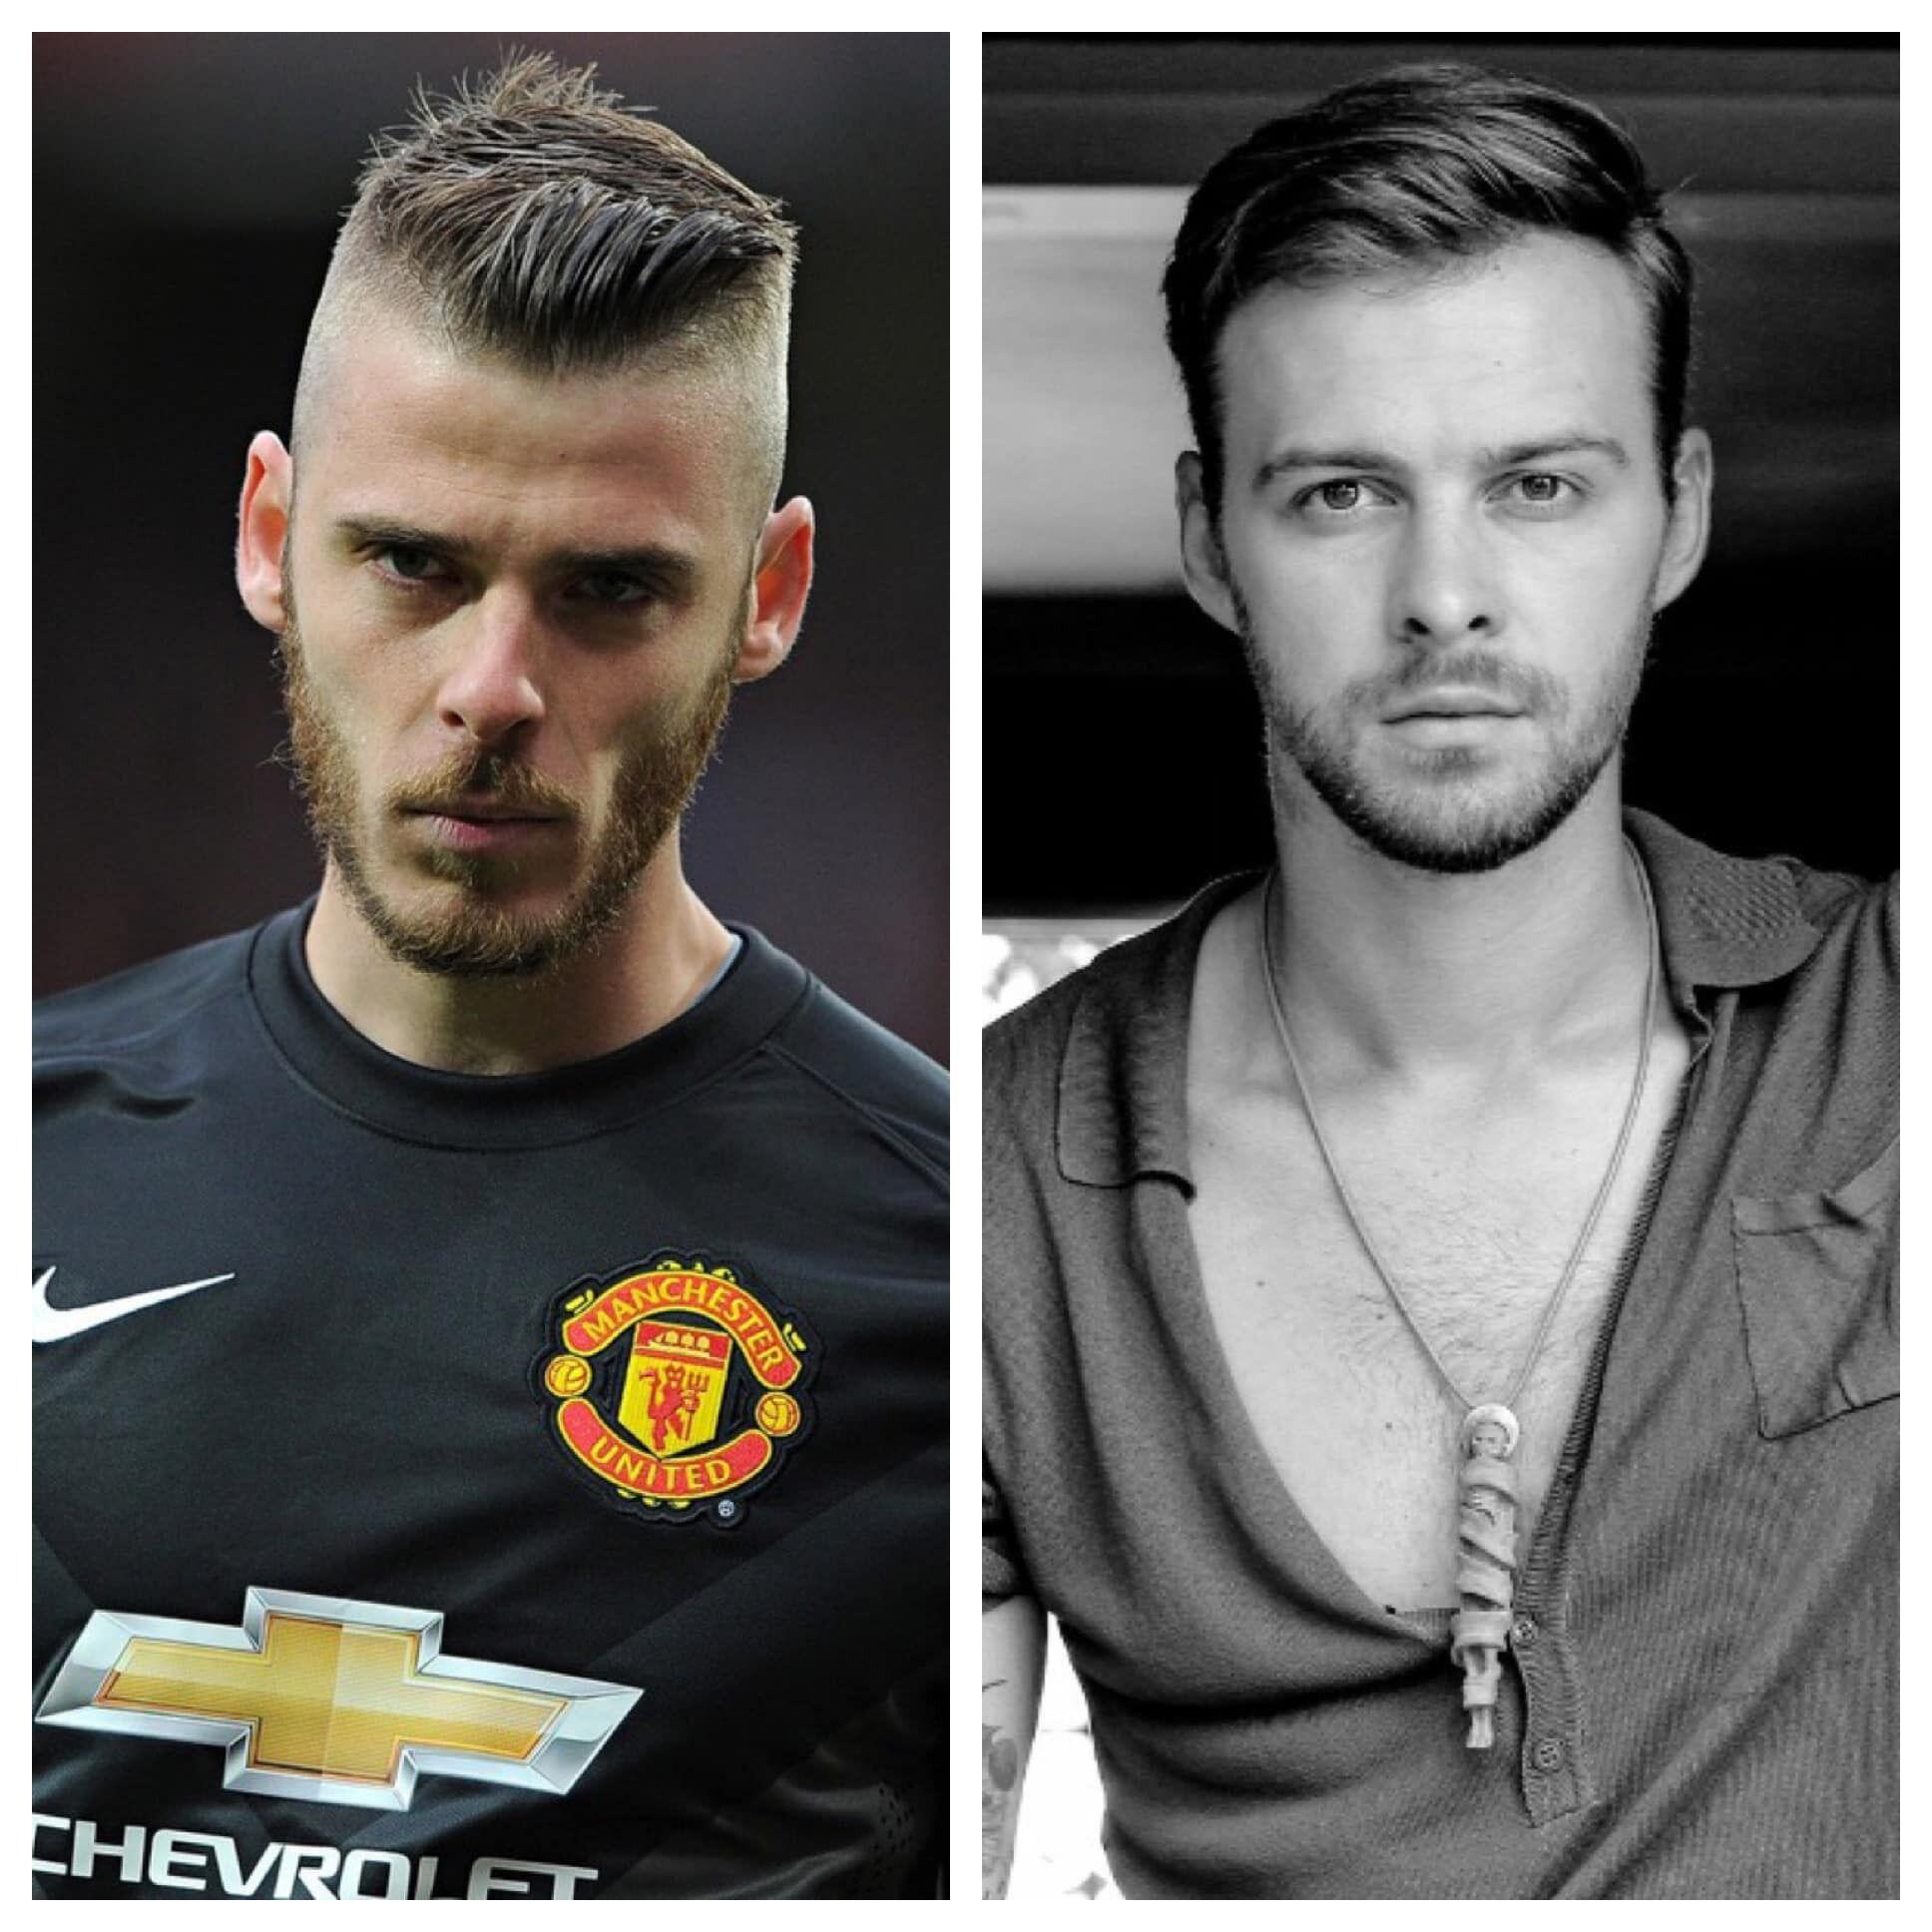 В сети сравнили испанского футболиста Давида де Хеа с украинским певцом Максом Барских